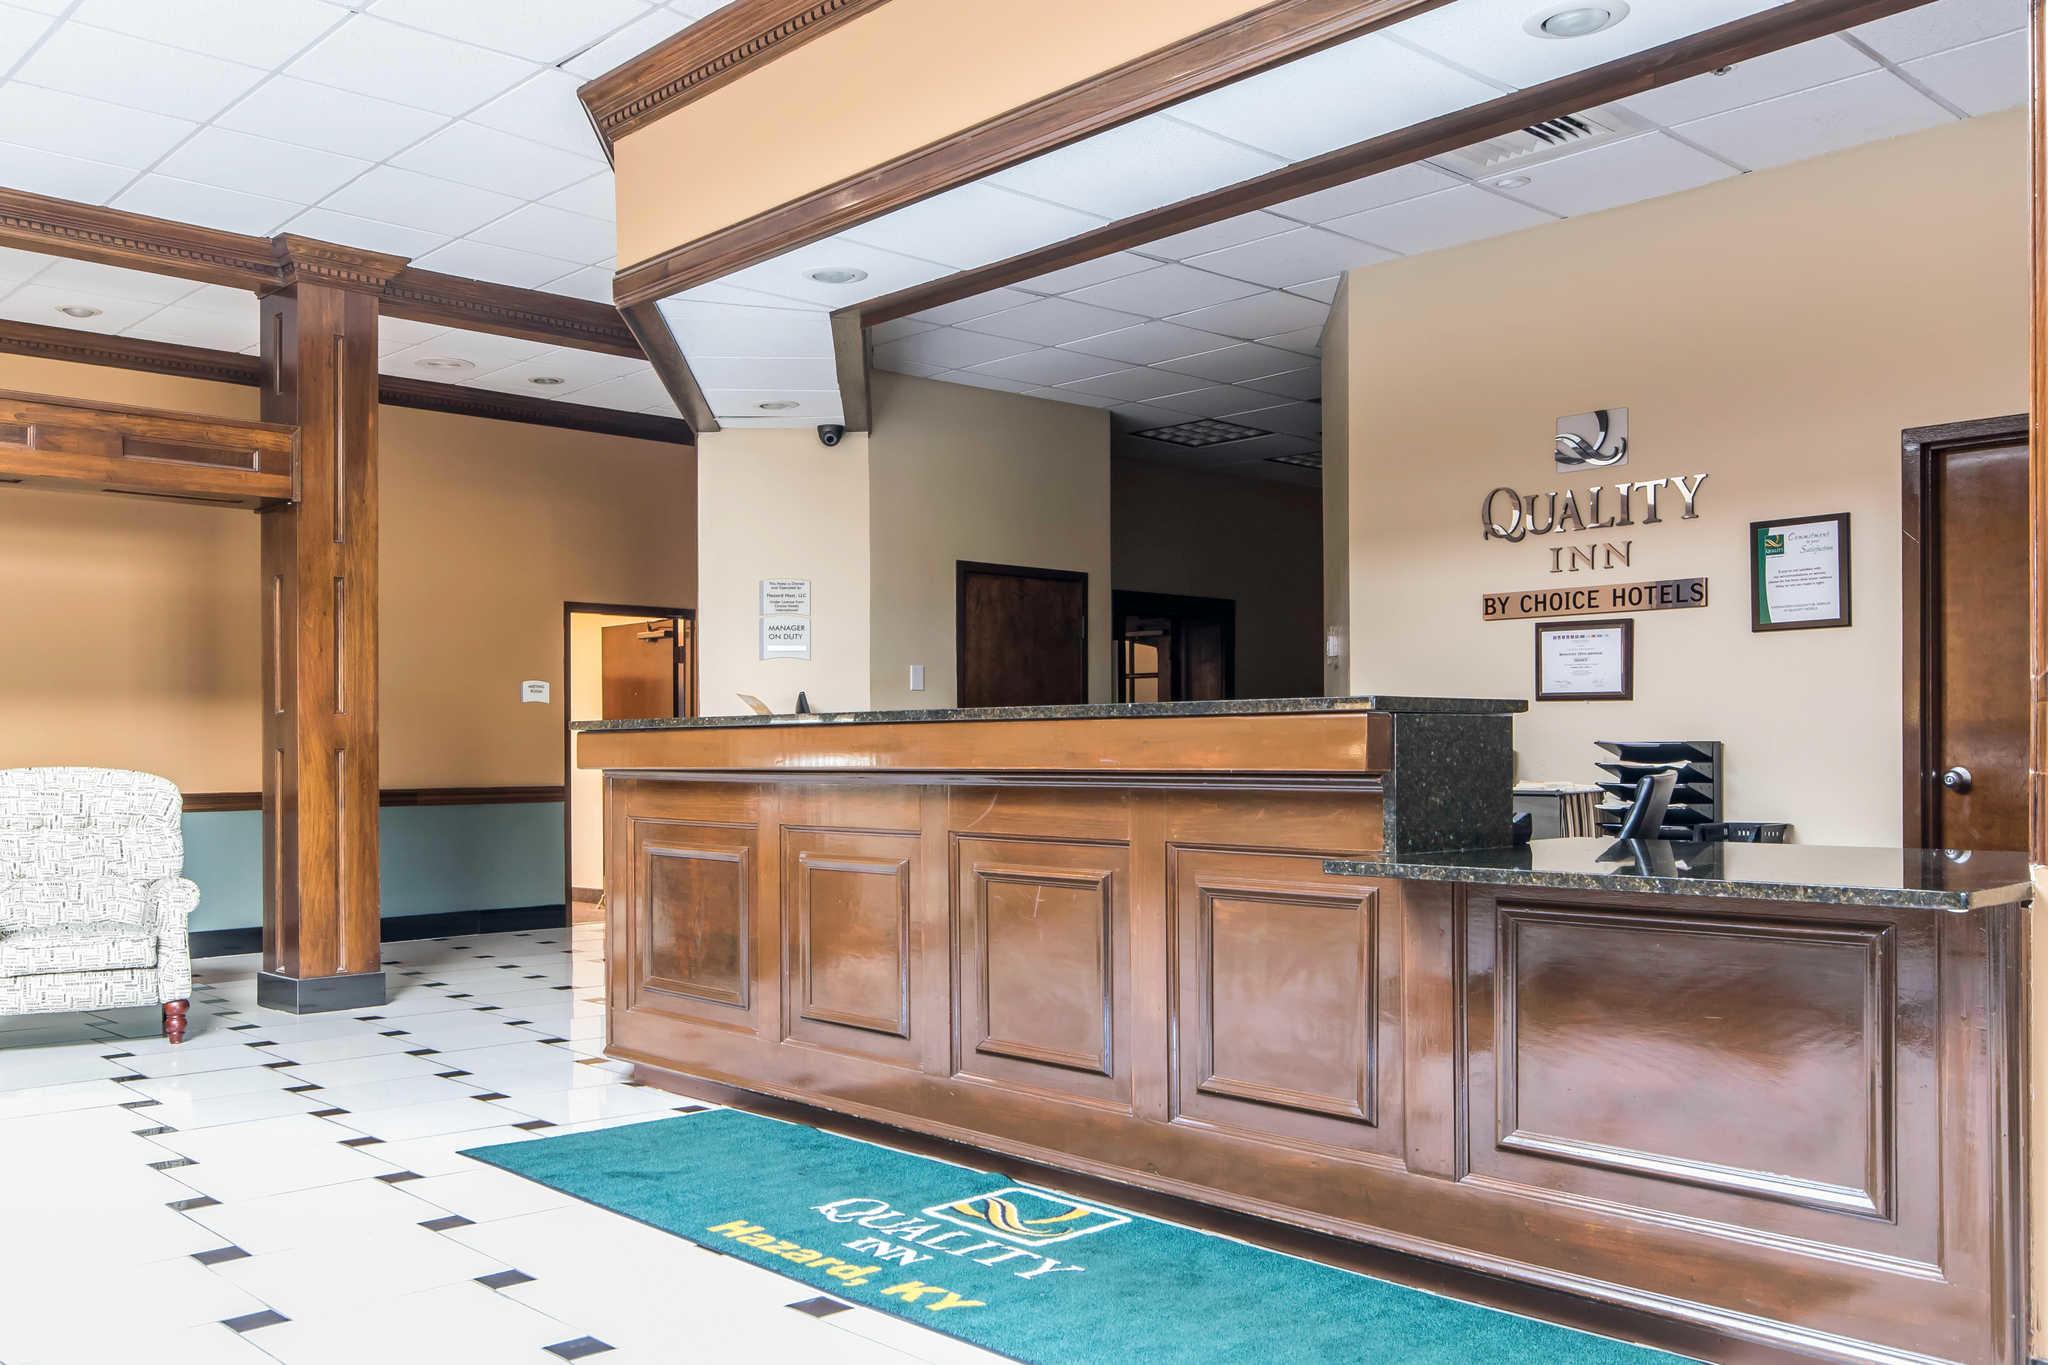 Quality Inn - Closed image 7